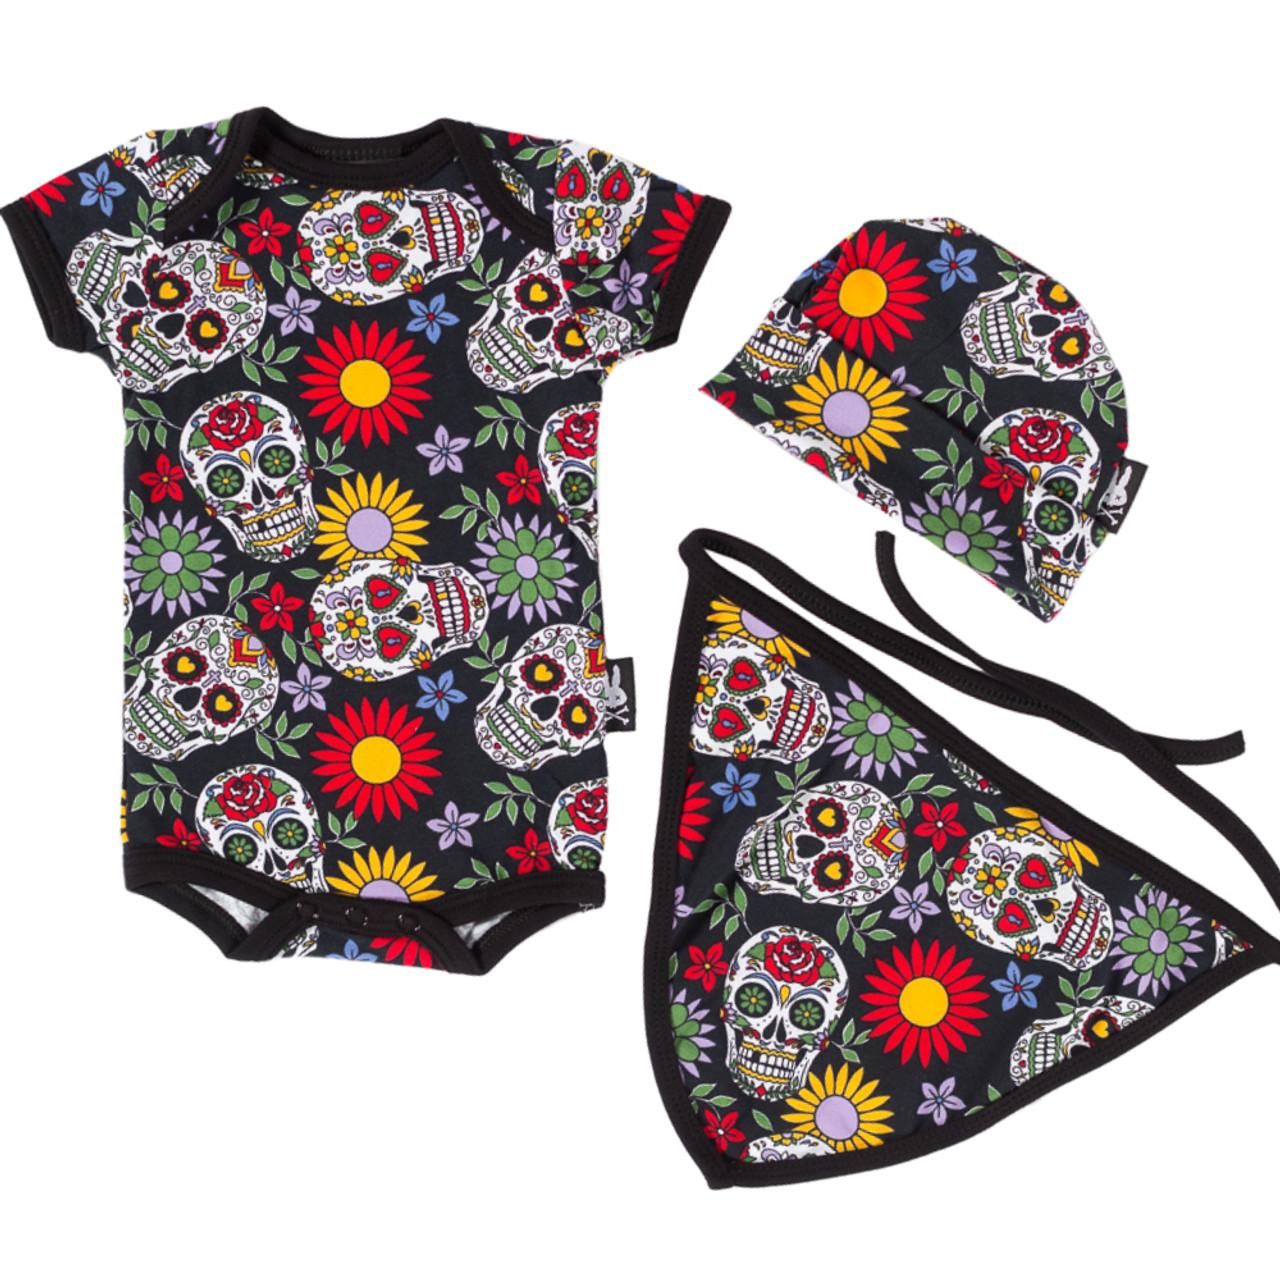 Six Bunnies tattoo shoppe gift set baby clothes alternative goth rock metal